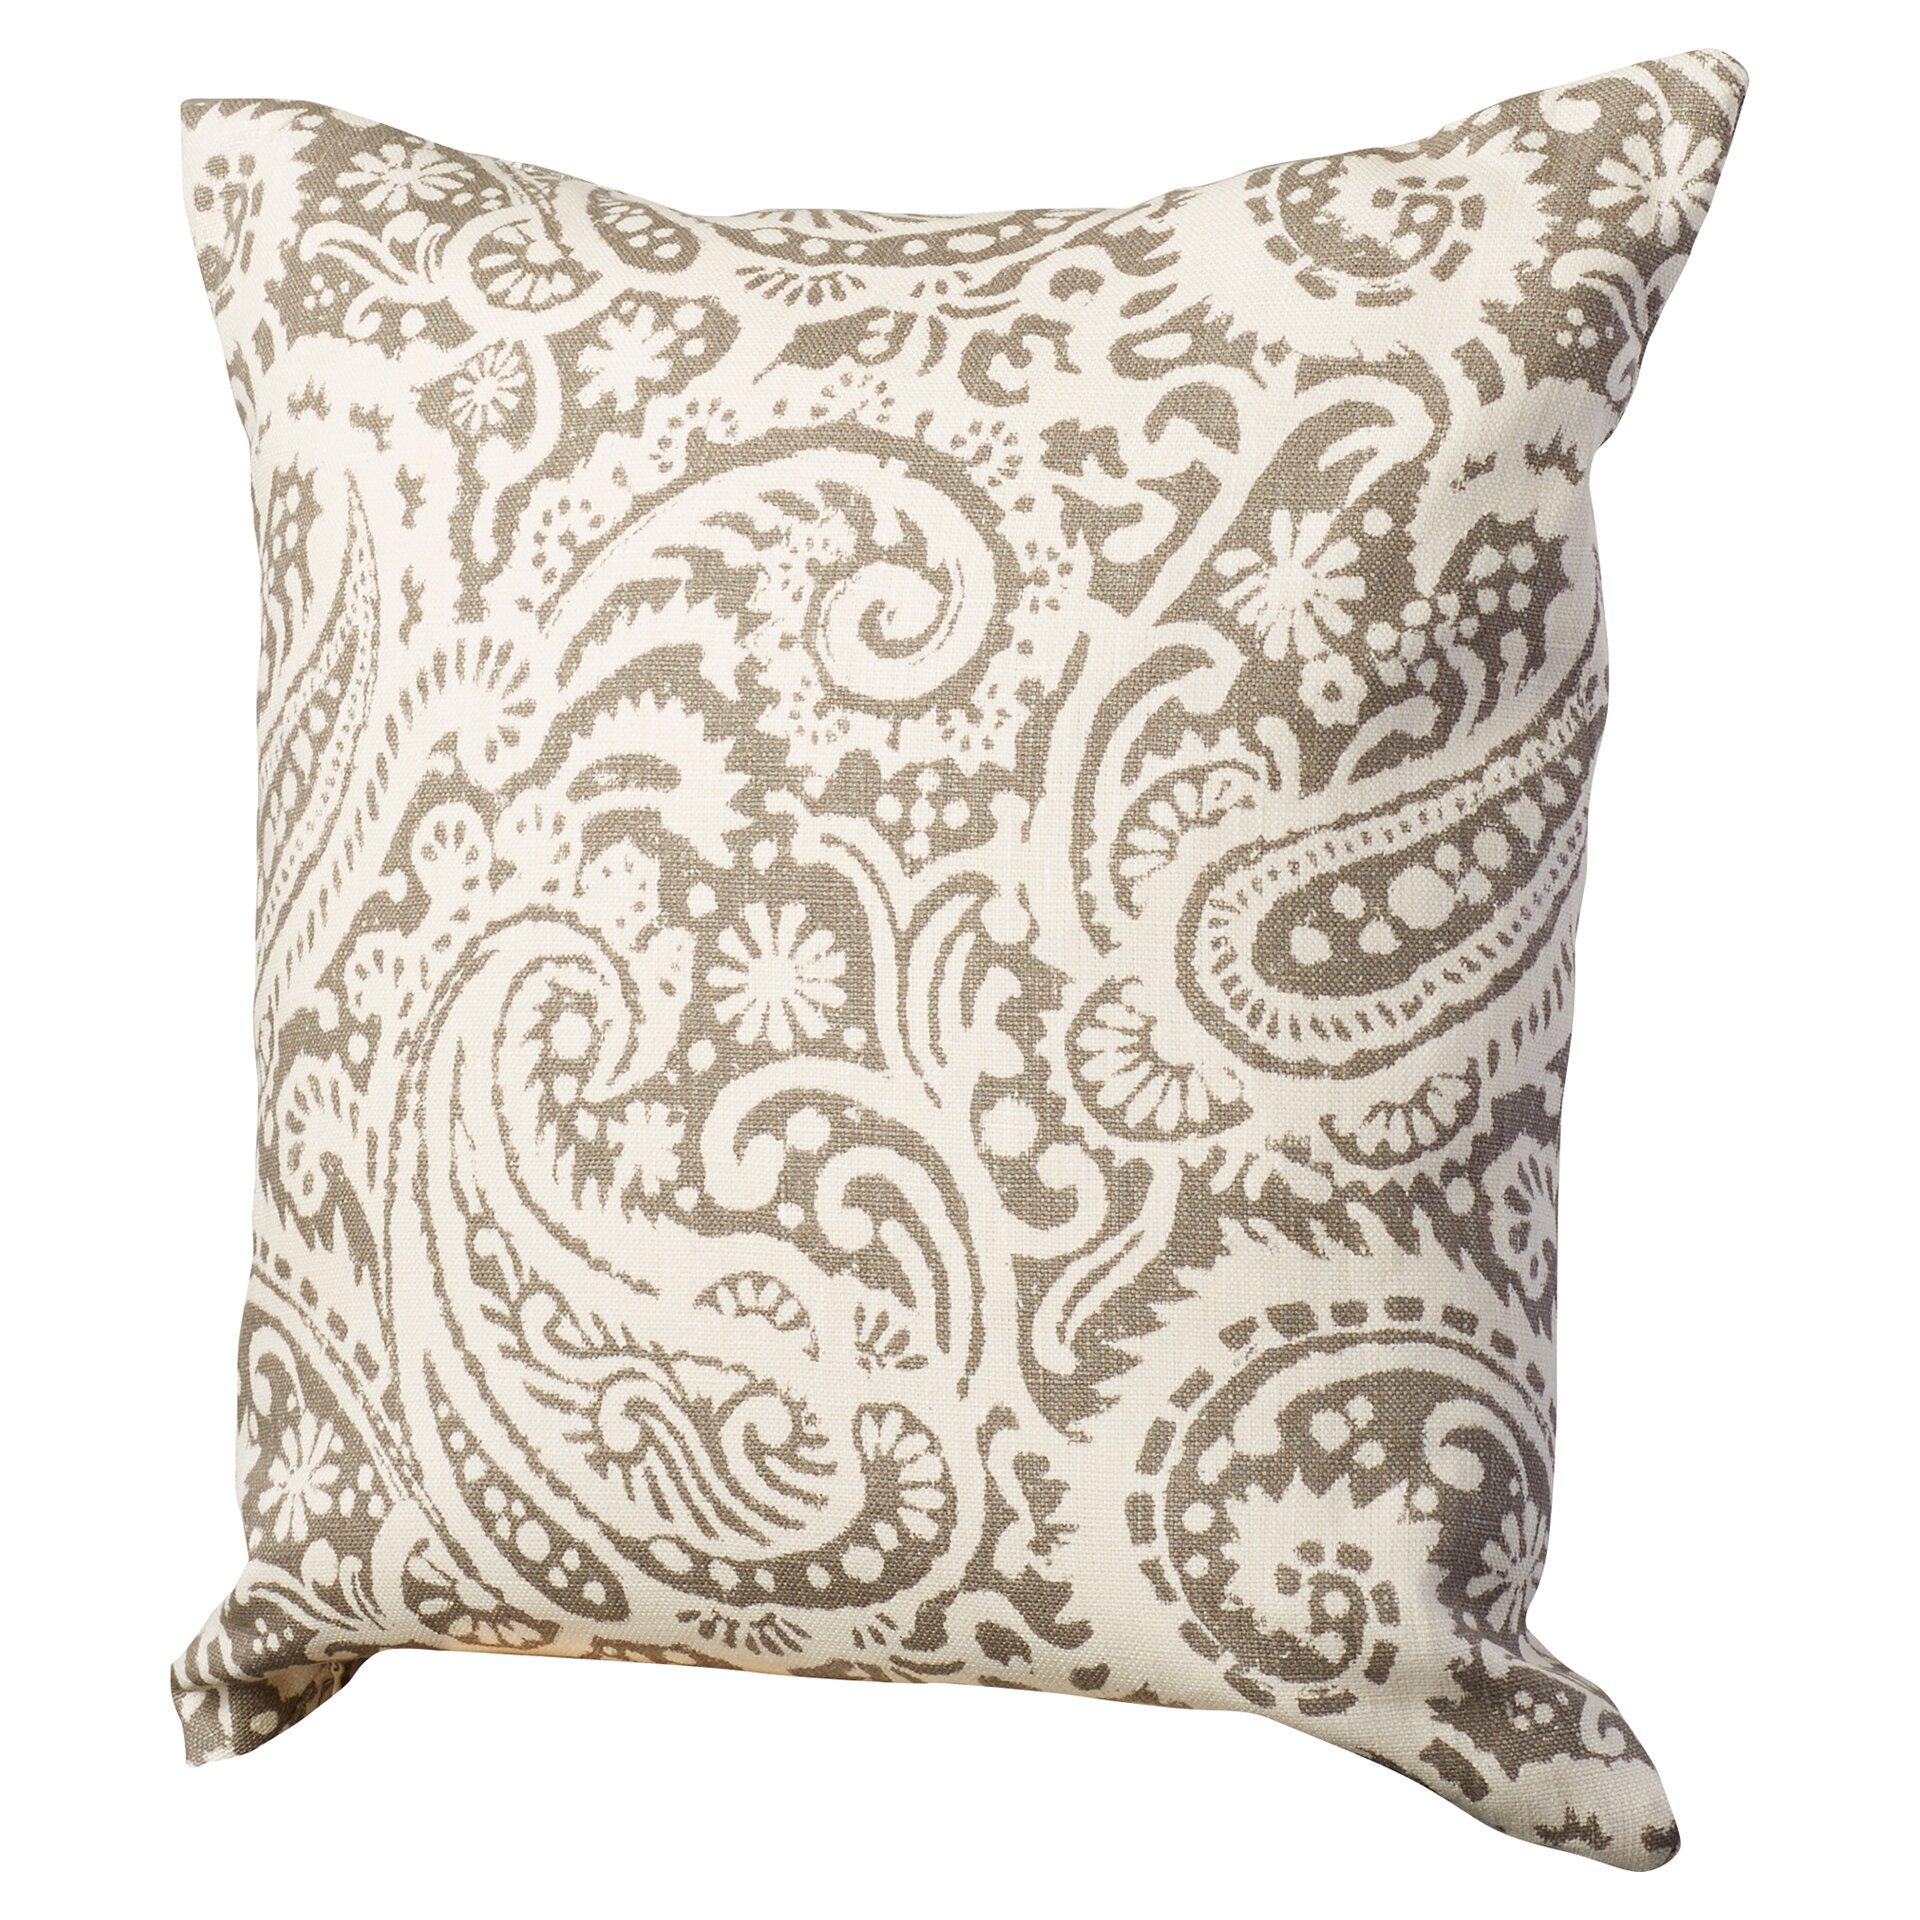 Lavender Throw Pillows : August Grove Francisca Paisley Linen Throw Pillow & Reviews Wayfair